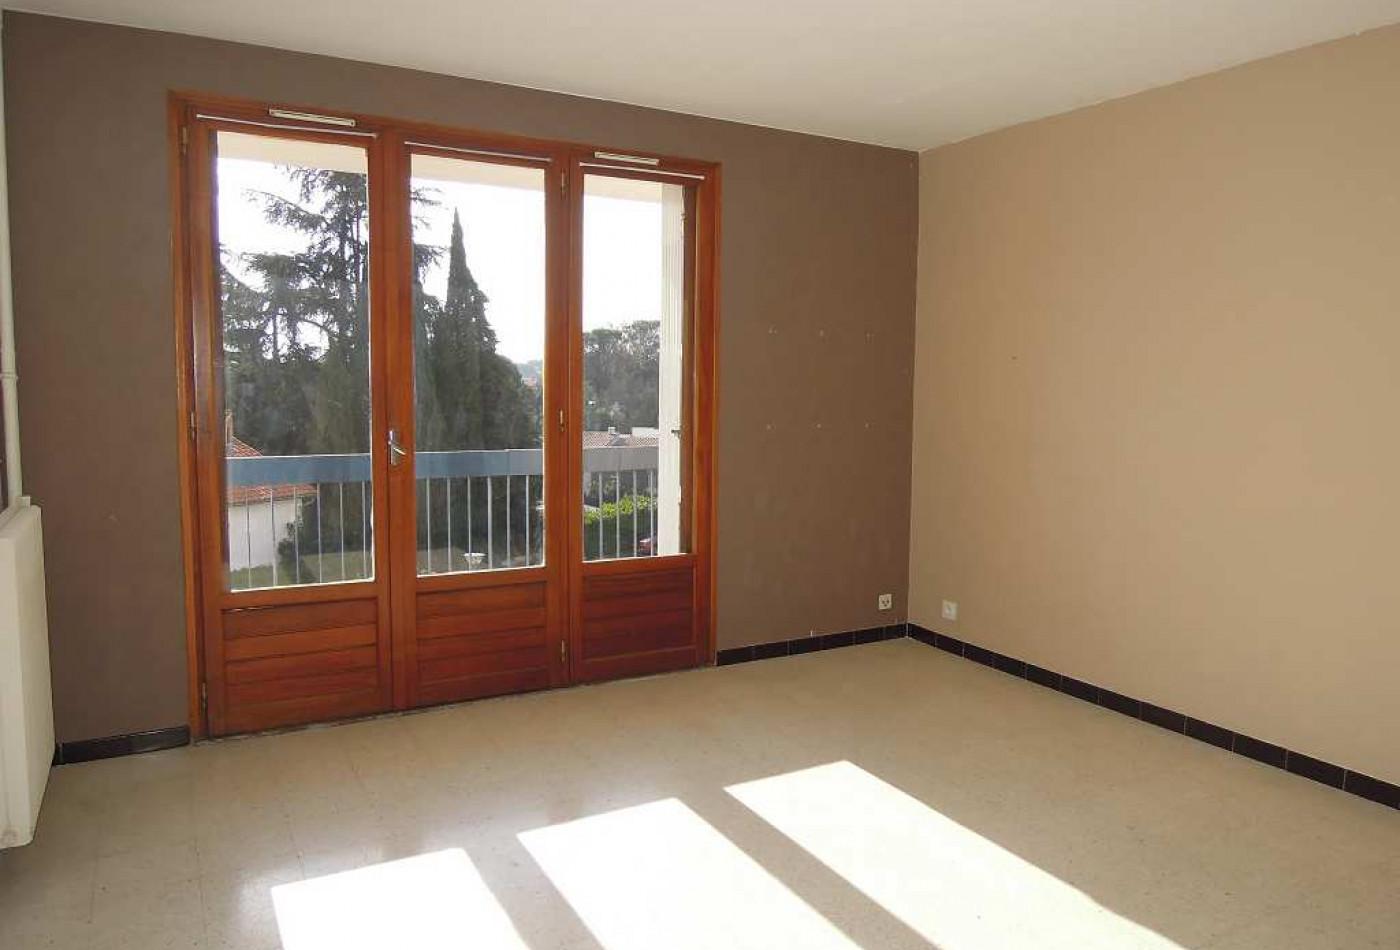 appartement en vente montpellier r f 341681966 frances immobilier. Black Bedroom Furniture Sets. Home Design Ideas